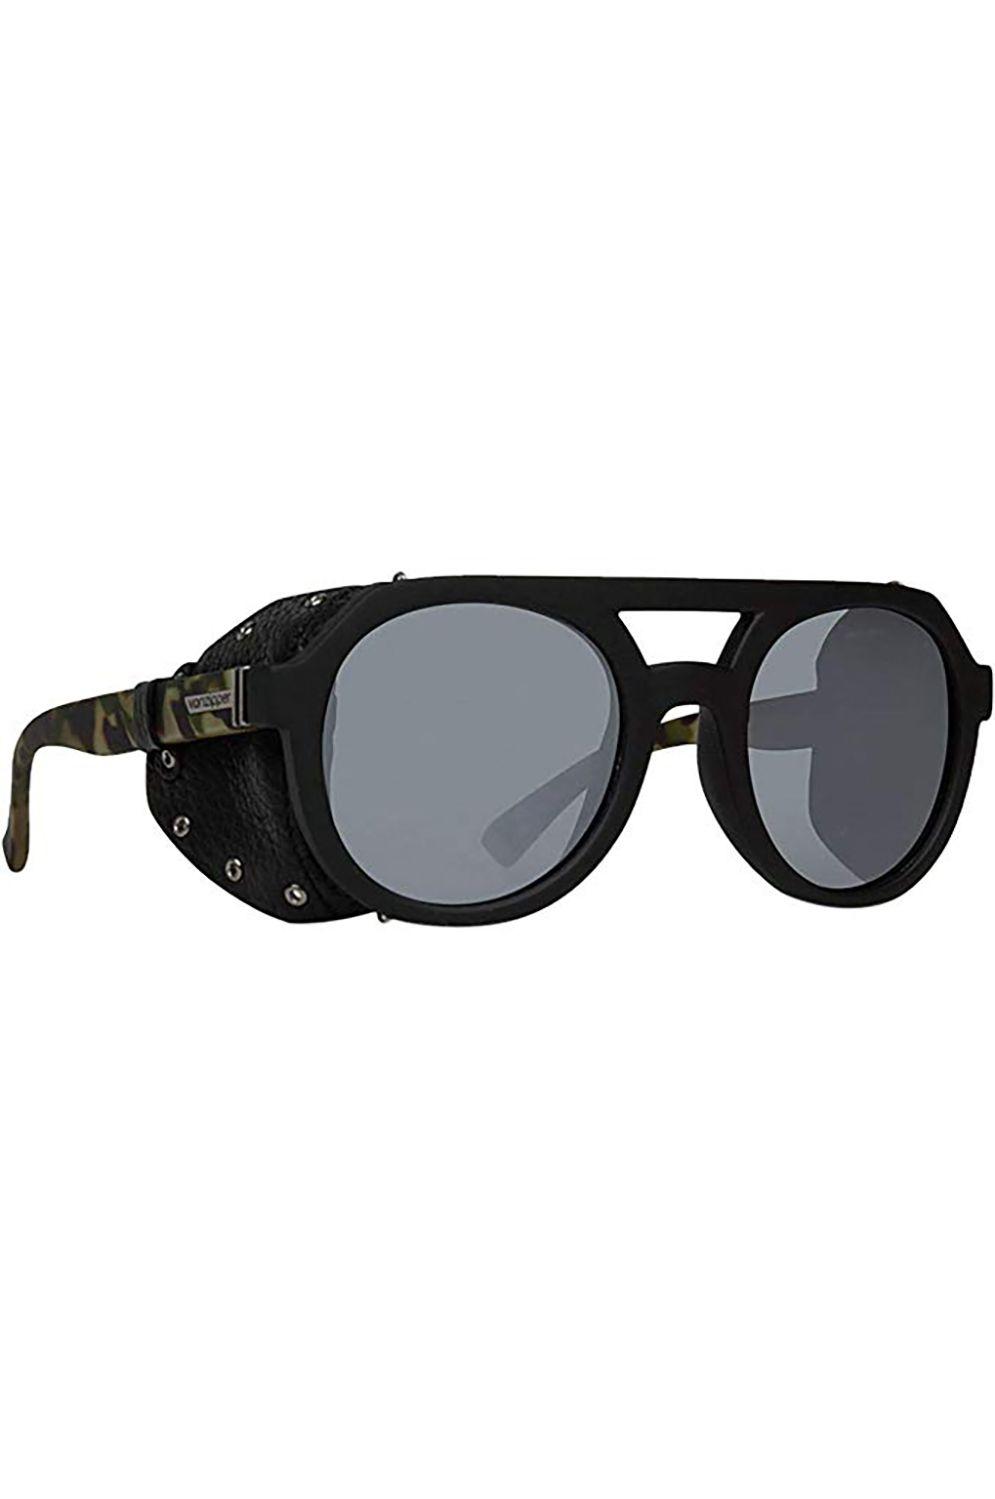 Oculos VonZipper PSYCHWIG Black Satin Camo / Grey Silver Flash Chrome